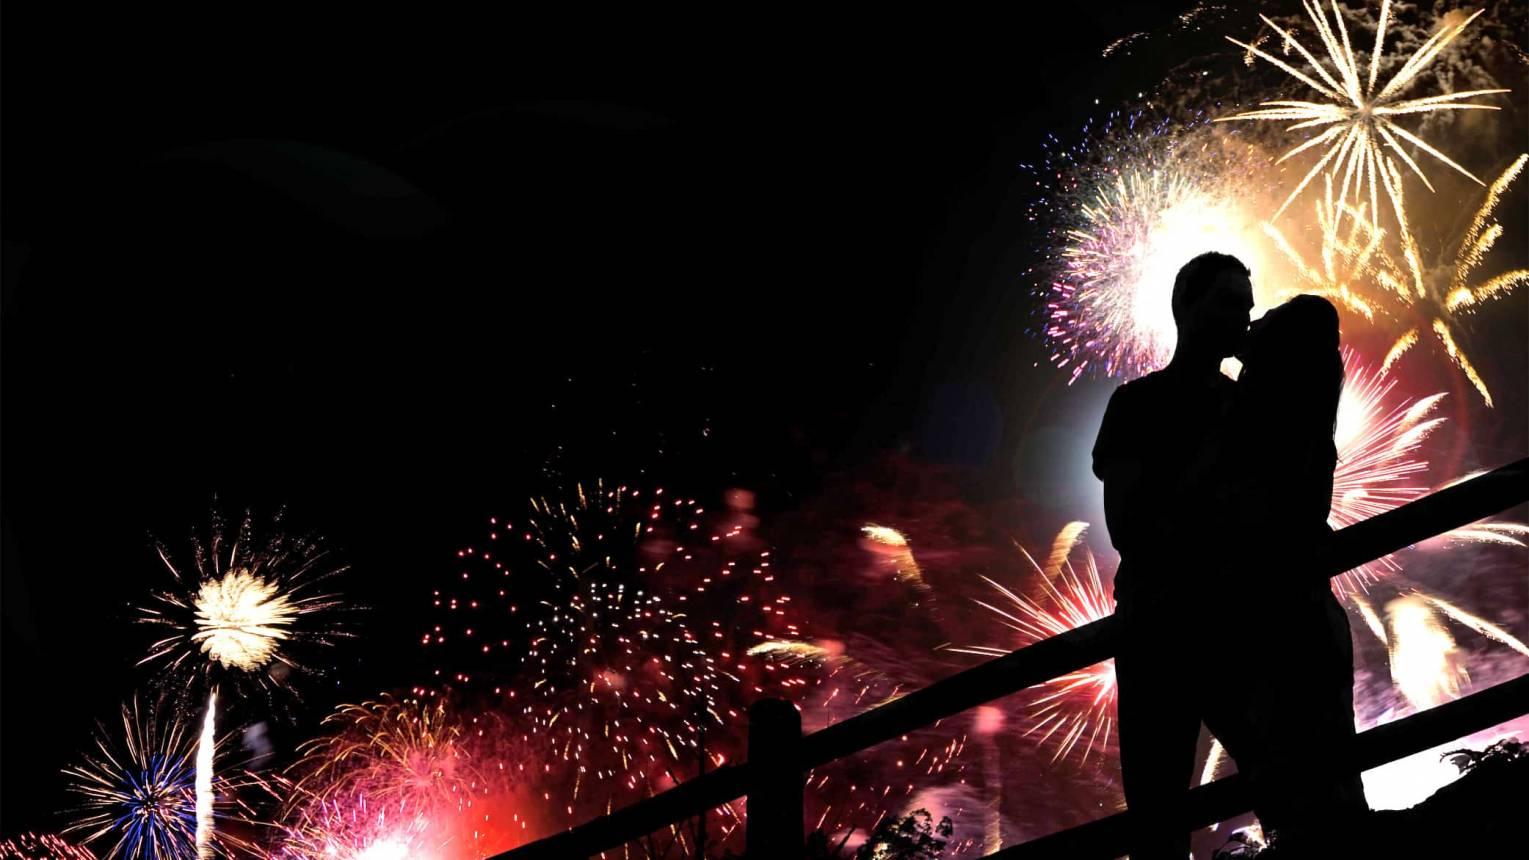 Ünnepi tűzijáték